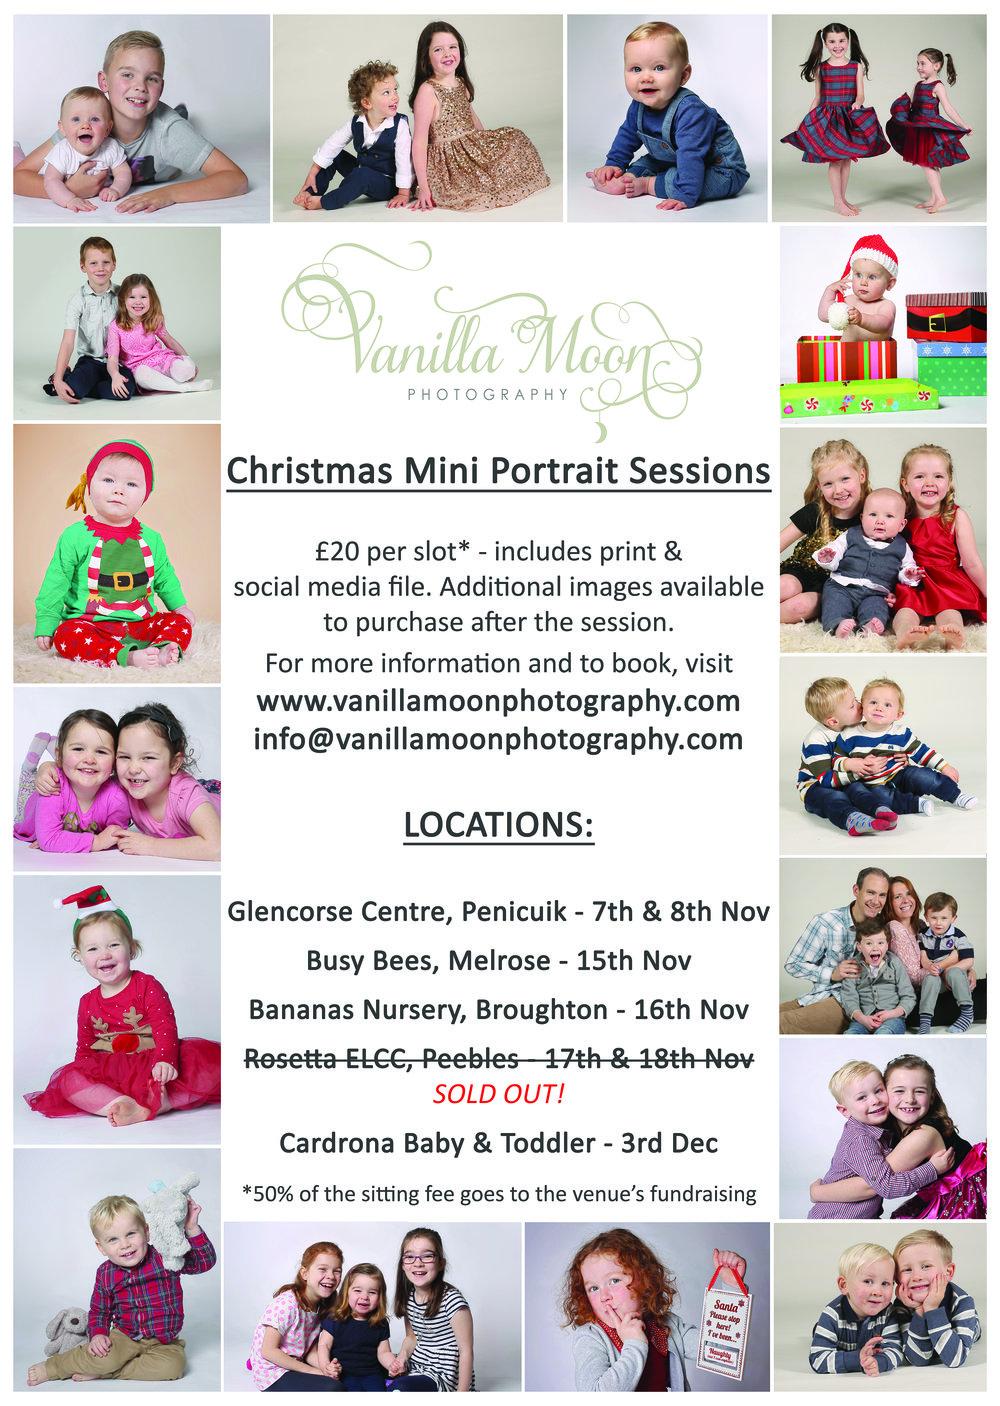 Christmas Mini Portrait Sessions Peebles, Cardrona, Broughton, Melrose, Auchendinny